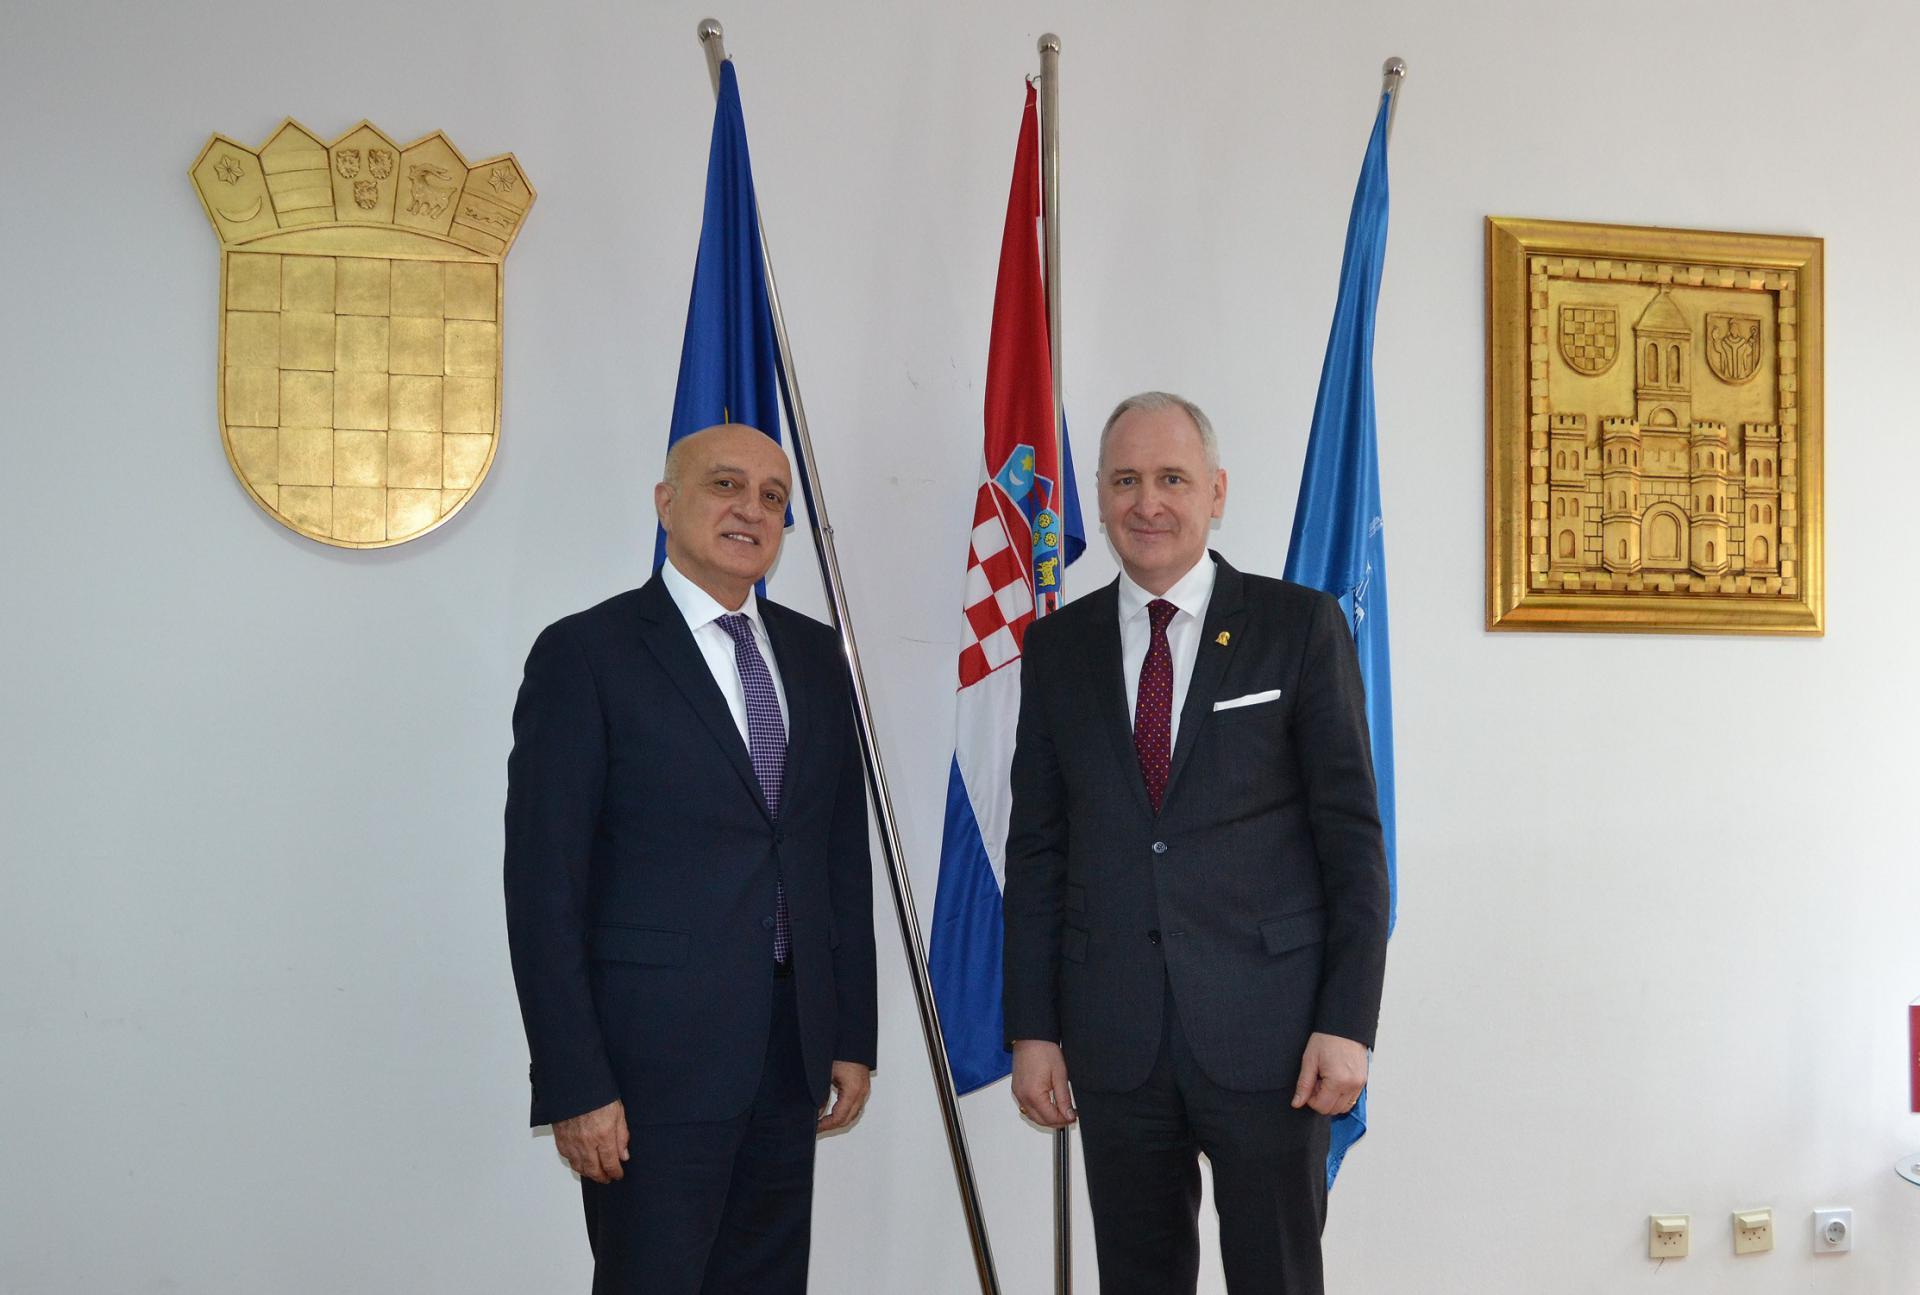 Gradonačelnik Krstulović Opara i veleposlanik Fakhraddin Gurbanov